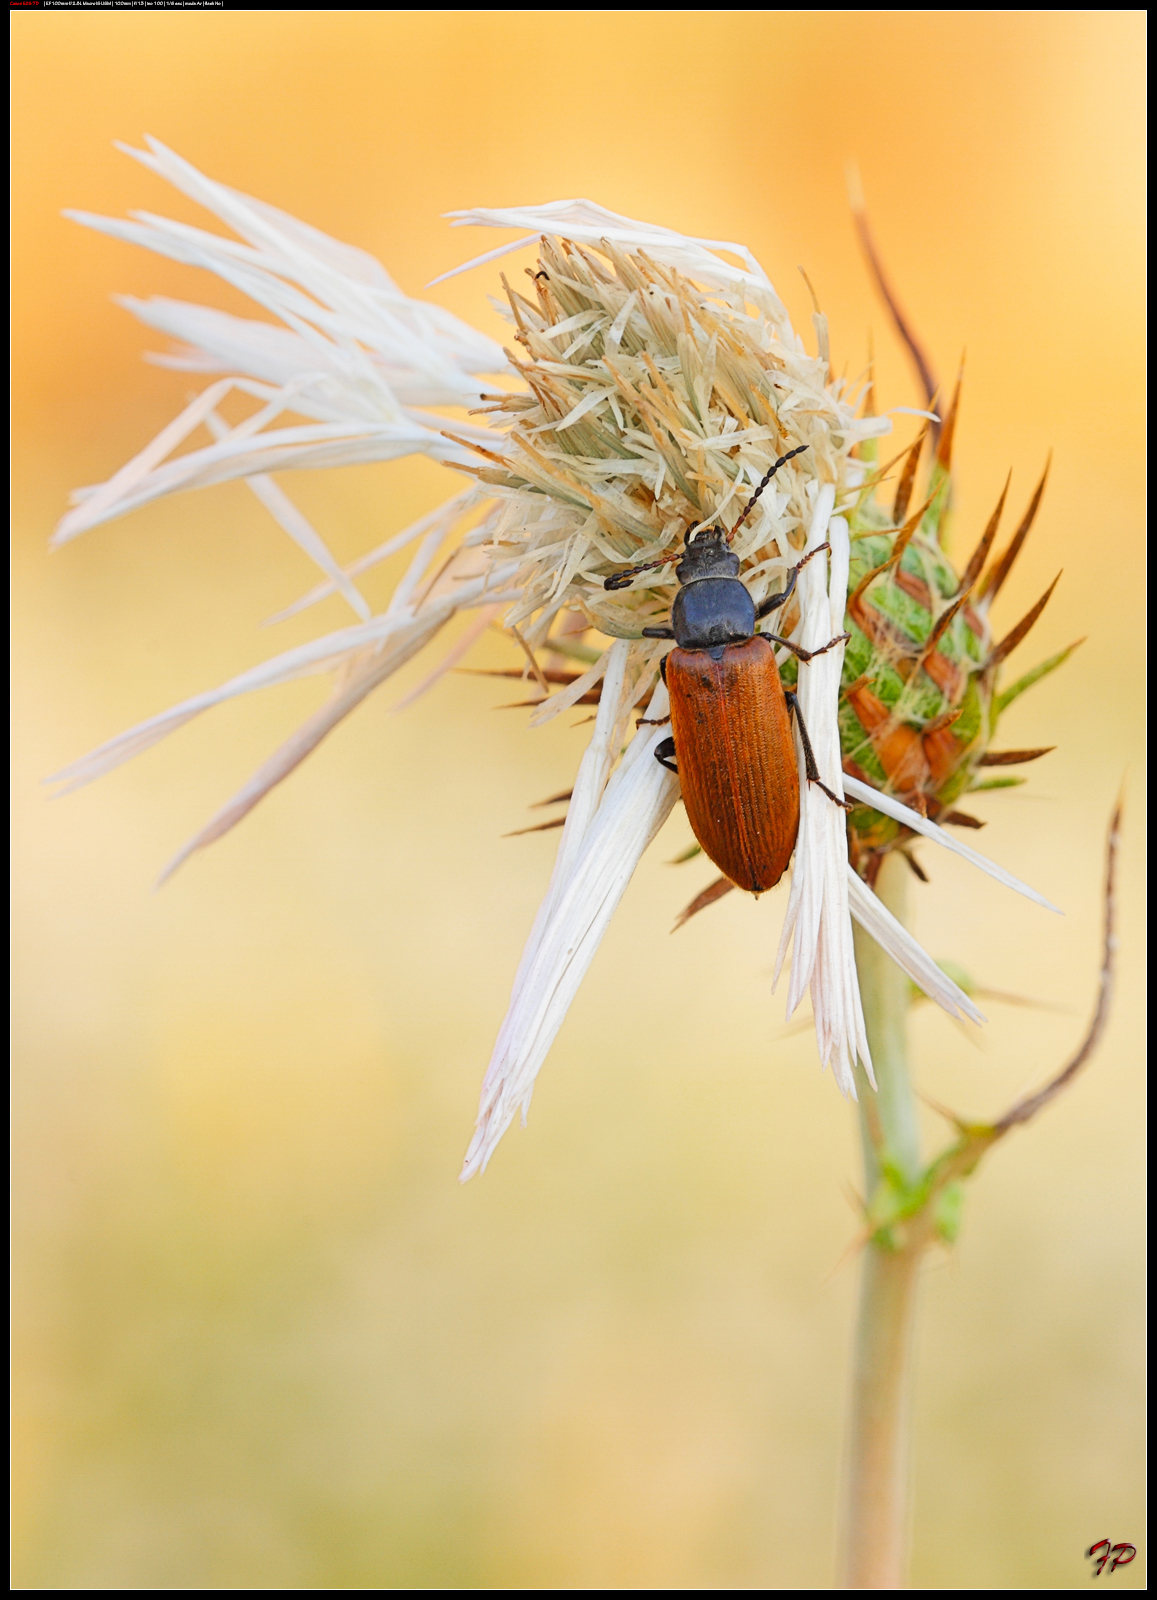 Omophlus lepturoides...